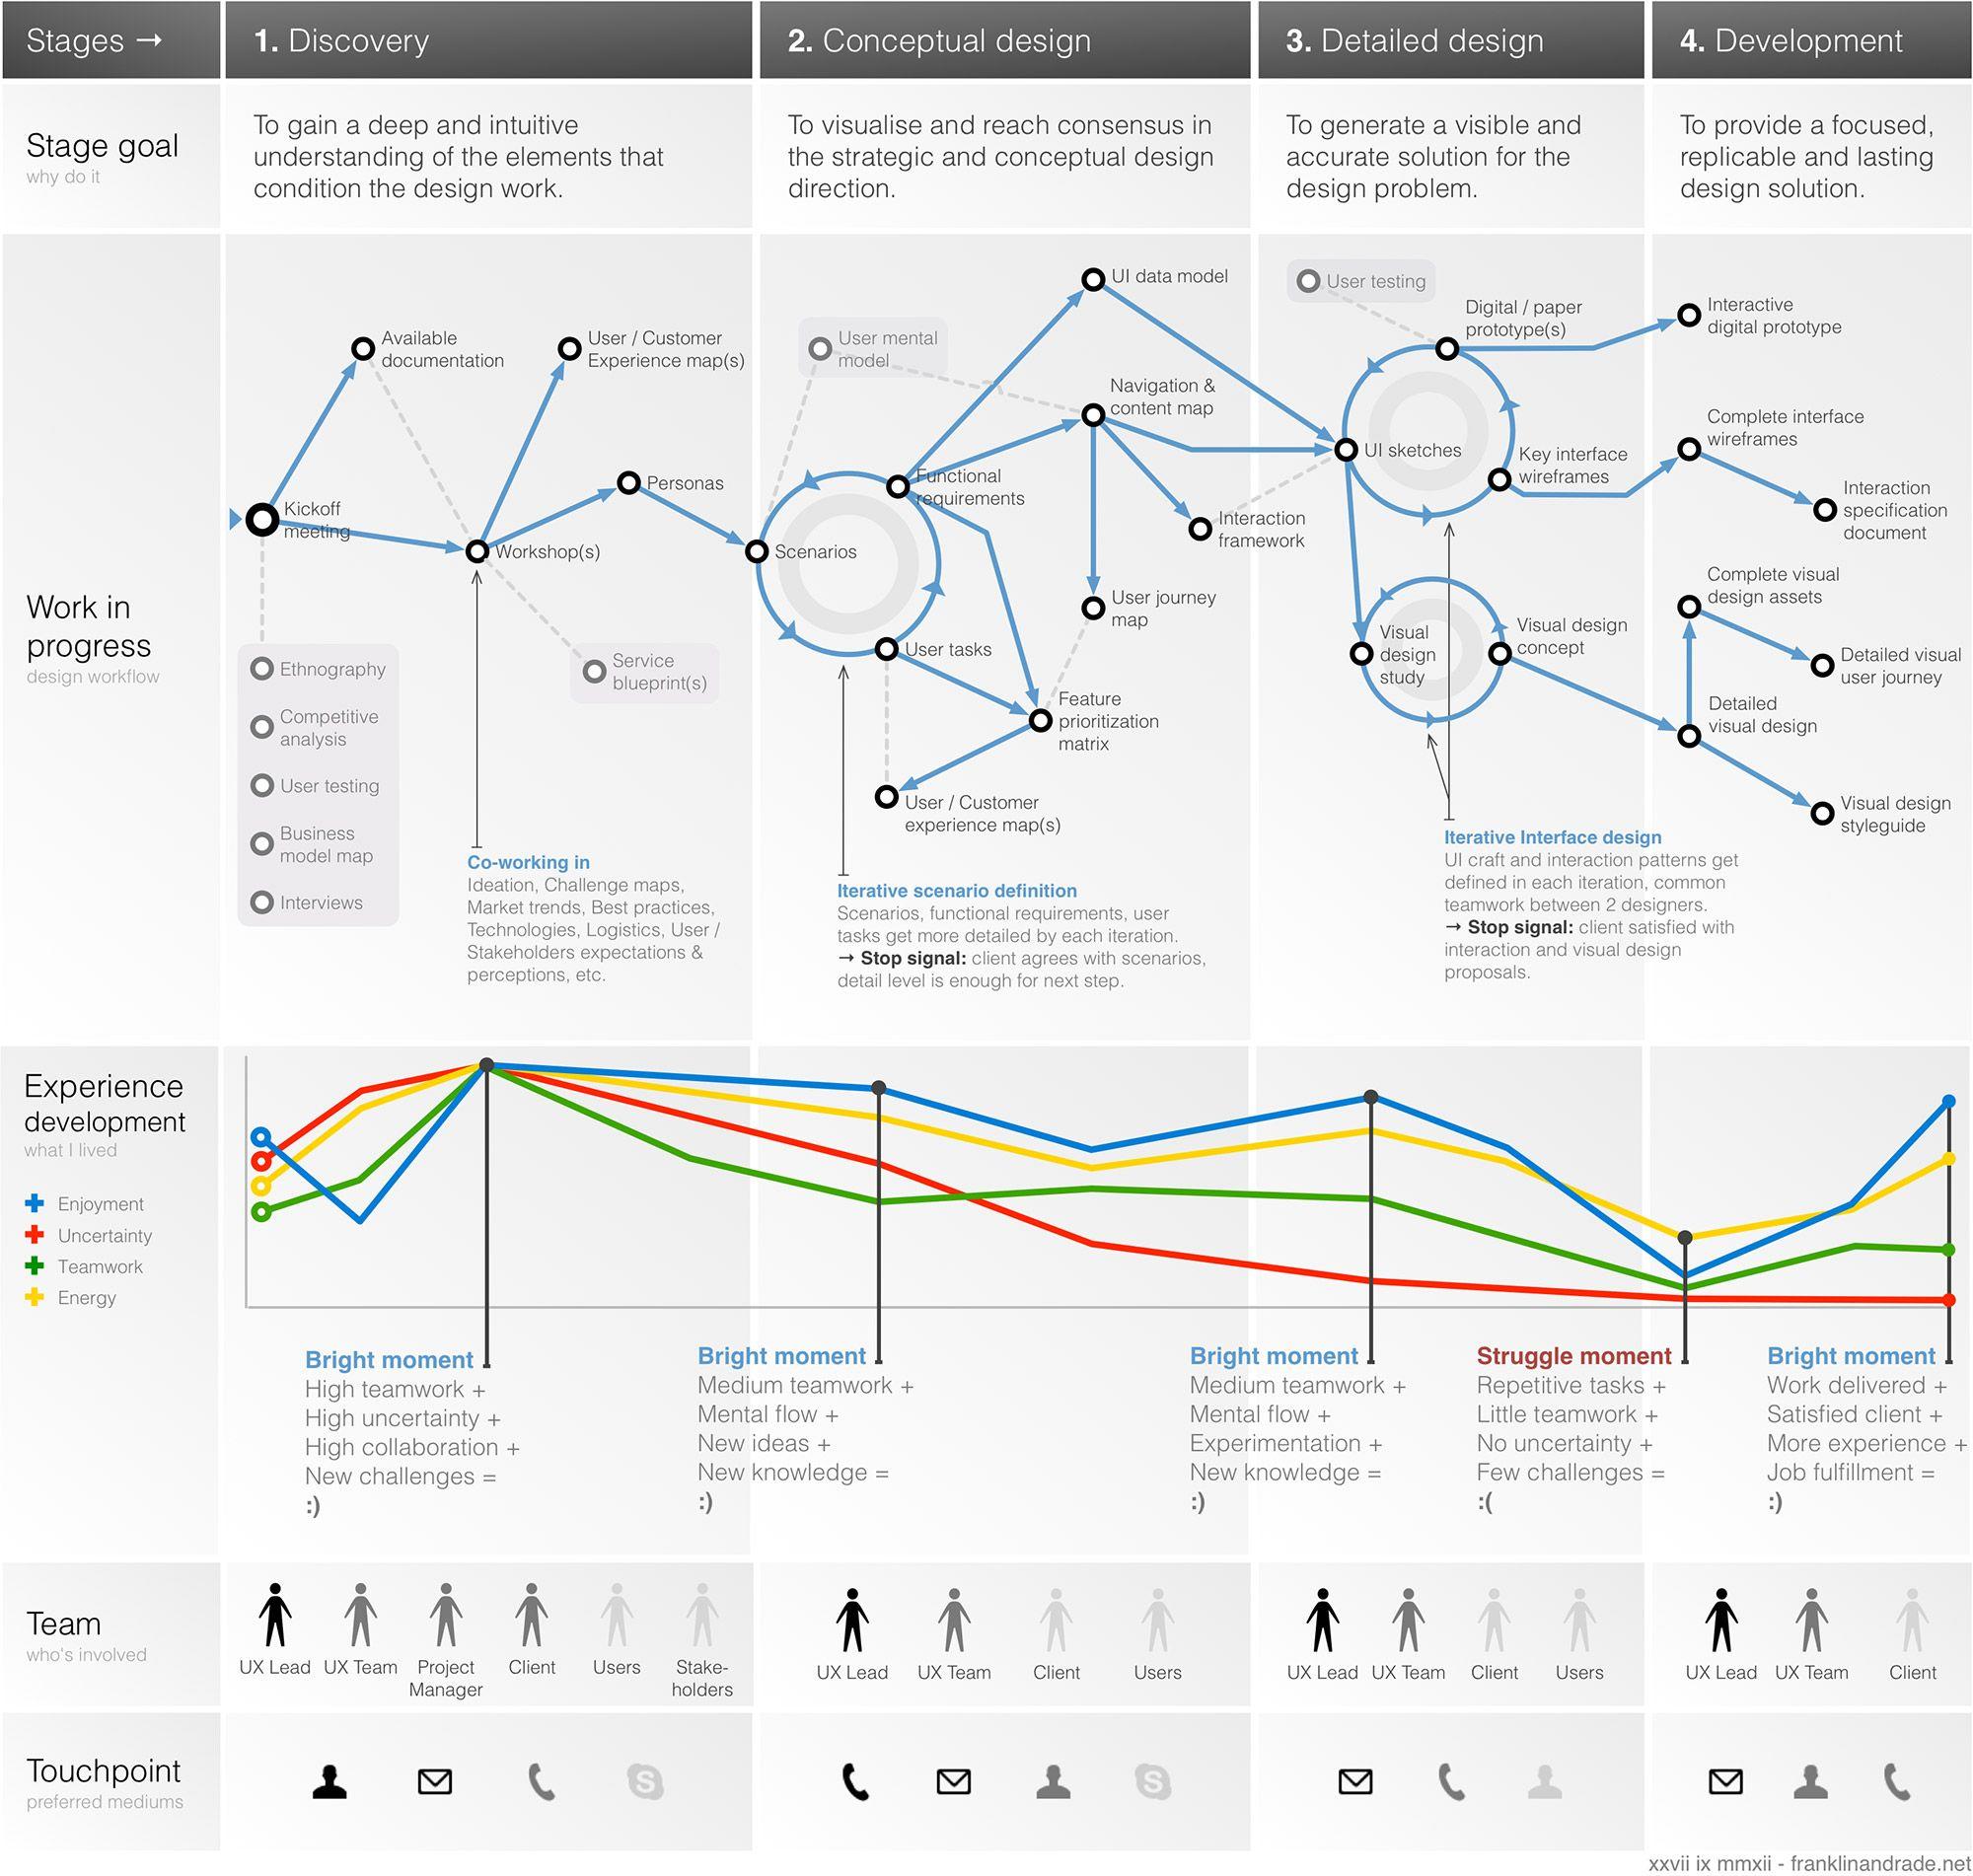 design-experience-map1.jpg 2,000×1,902 pixels | Design | Pinterest ...